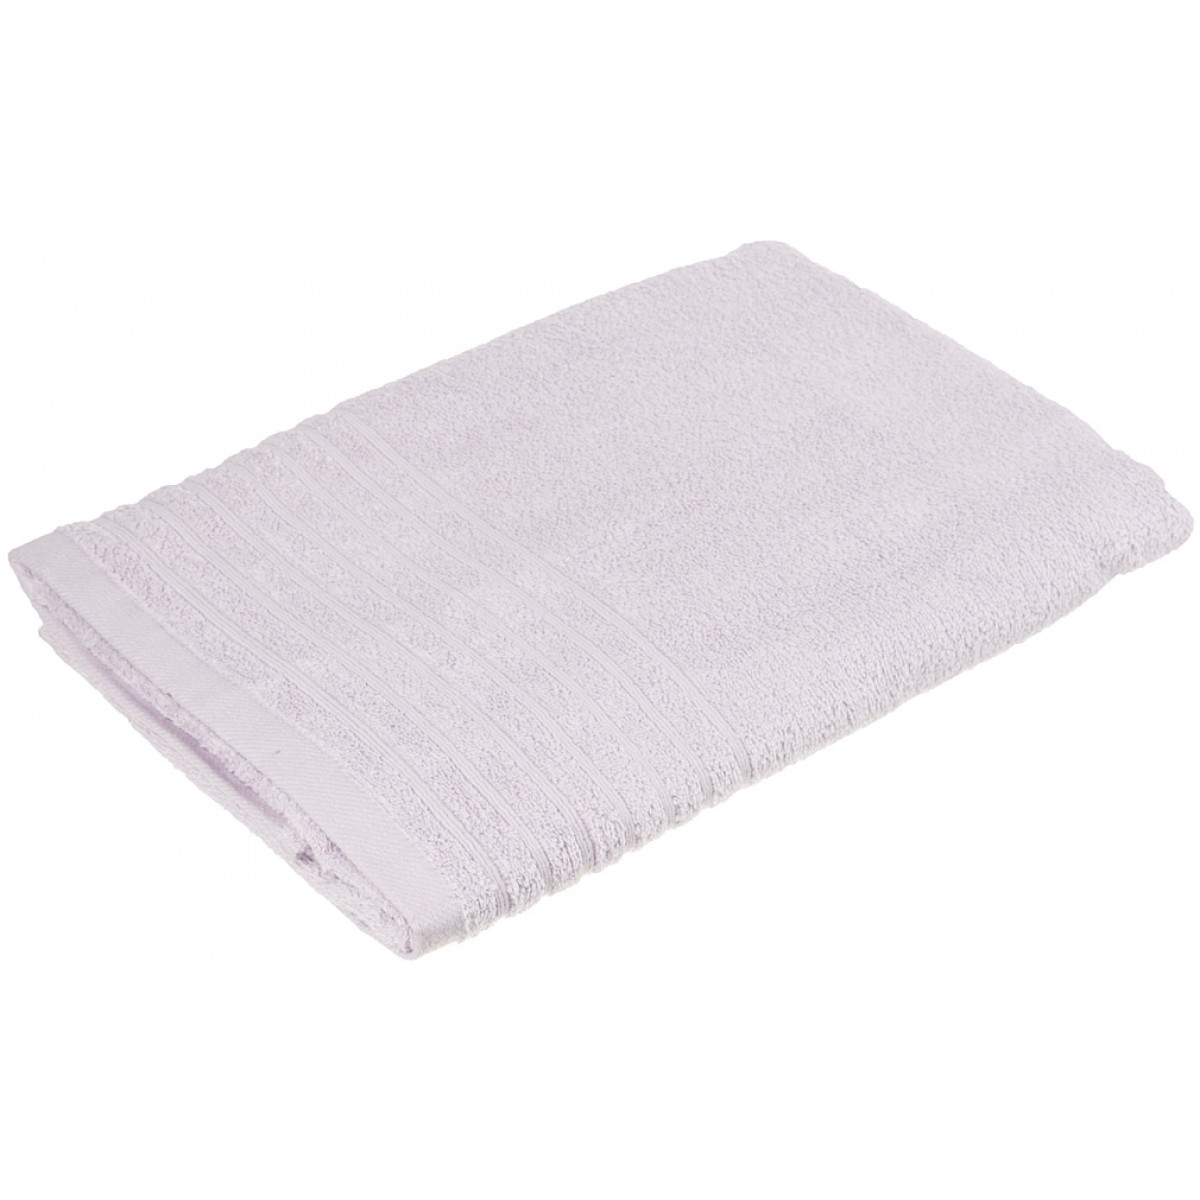 Полотенца Santalino Полотенце Blaize  (70х140 см) полотенца tango полотенце jackie 70х140 см